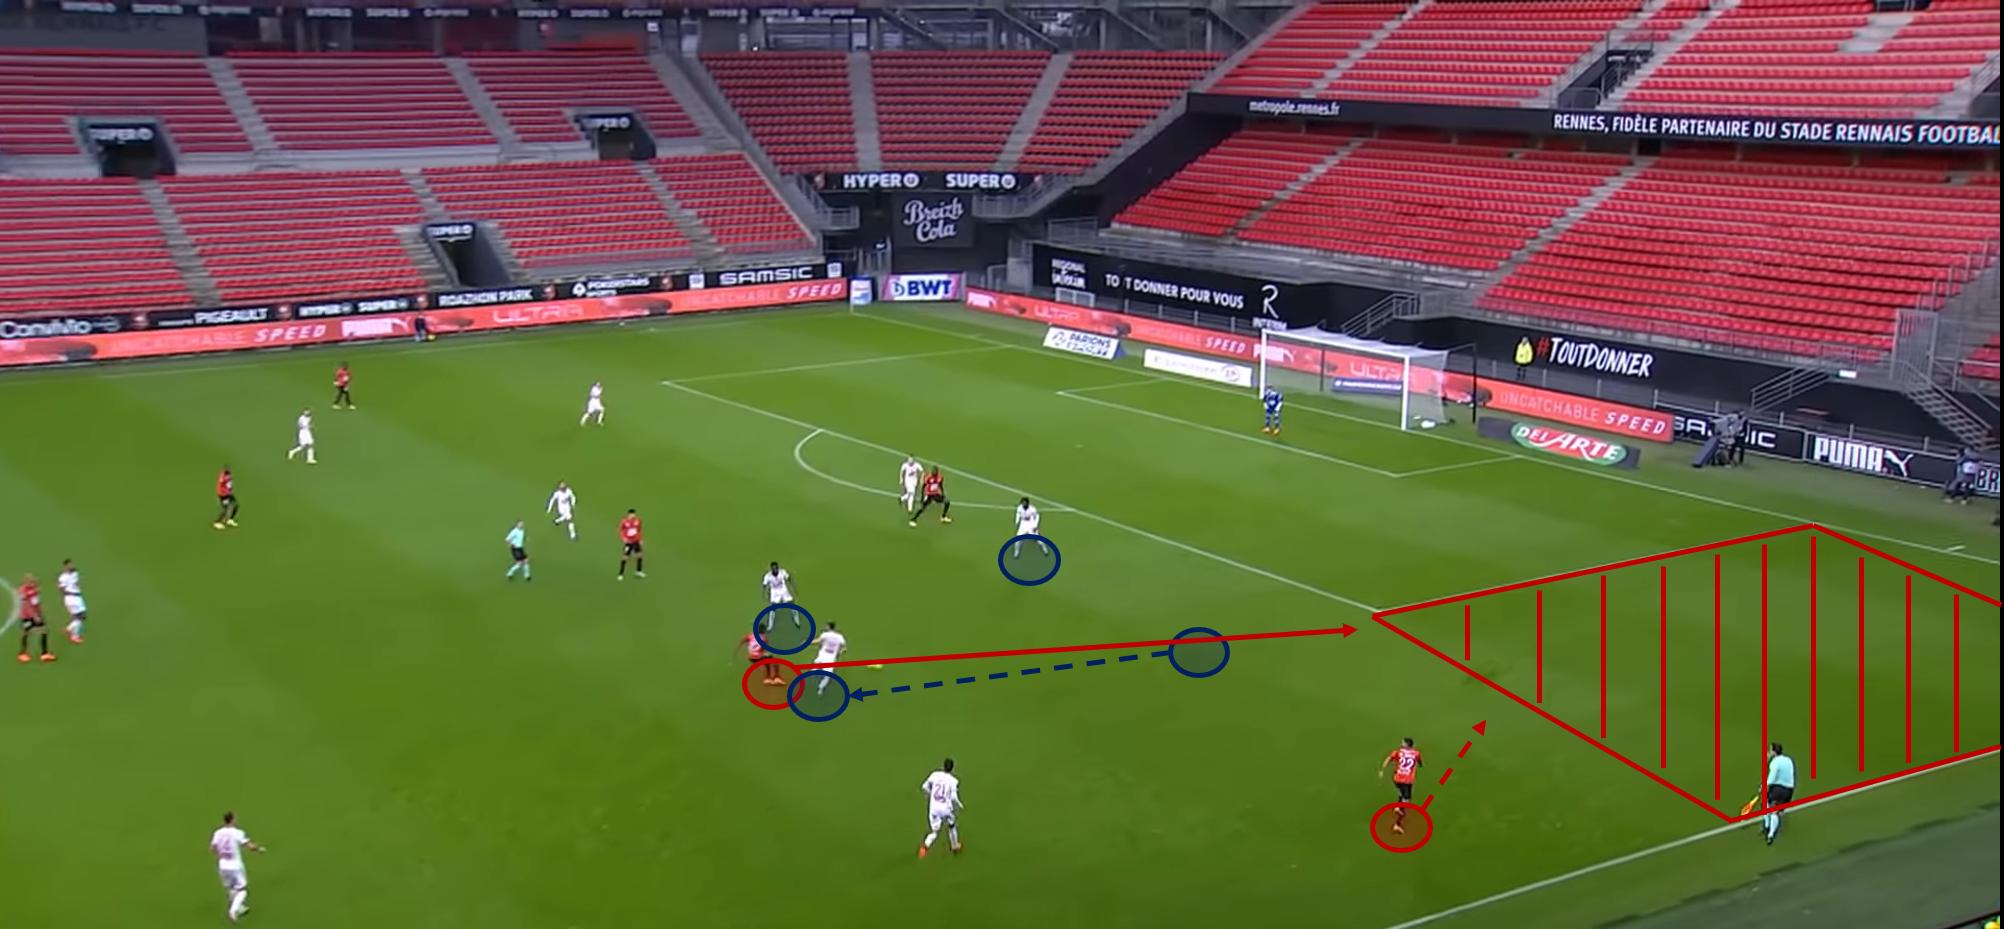 UEFA Champions League 2020/21: Chelsea vs Rennes – tactical preview analysis tactics